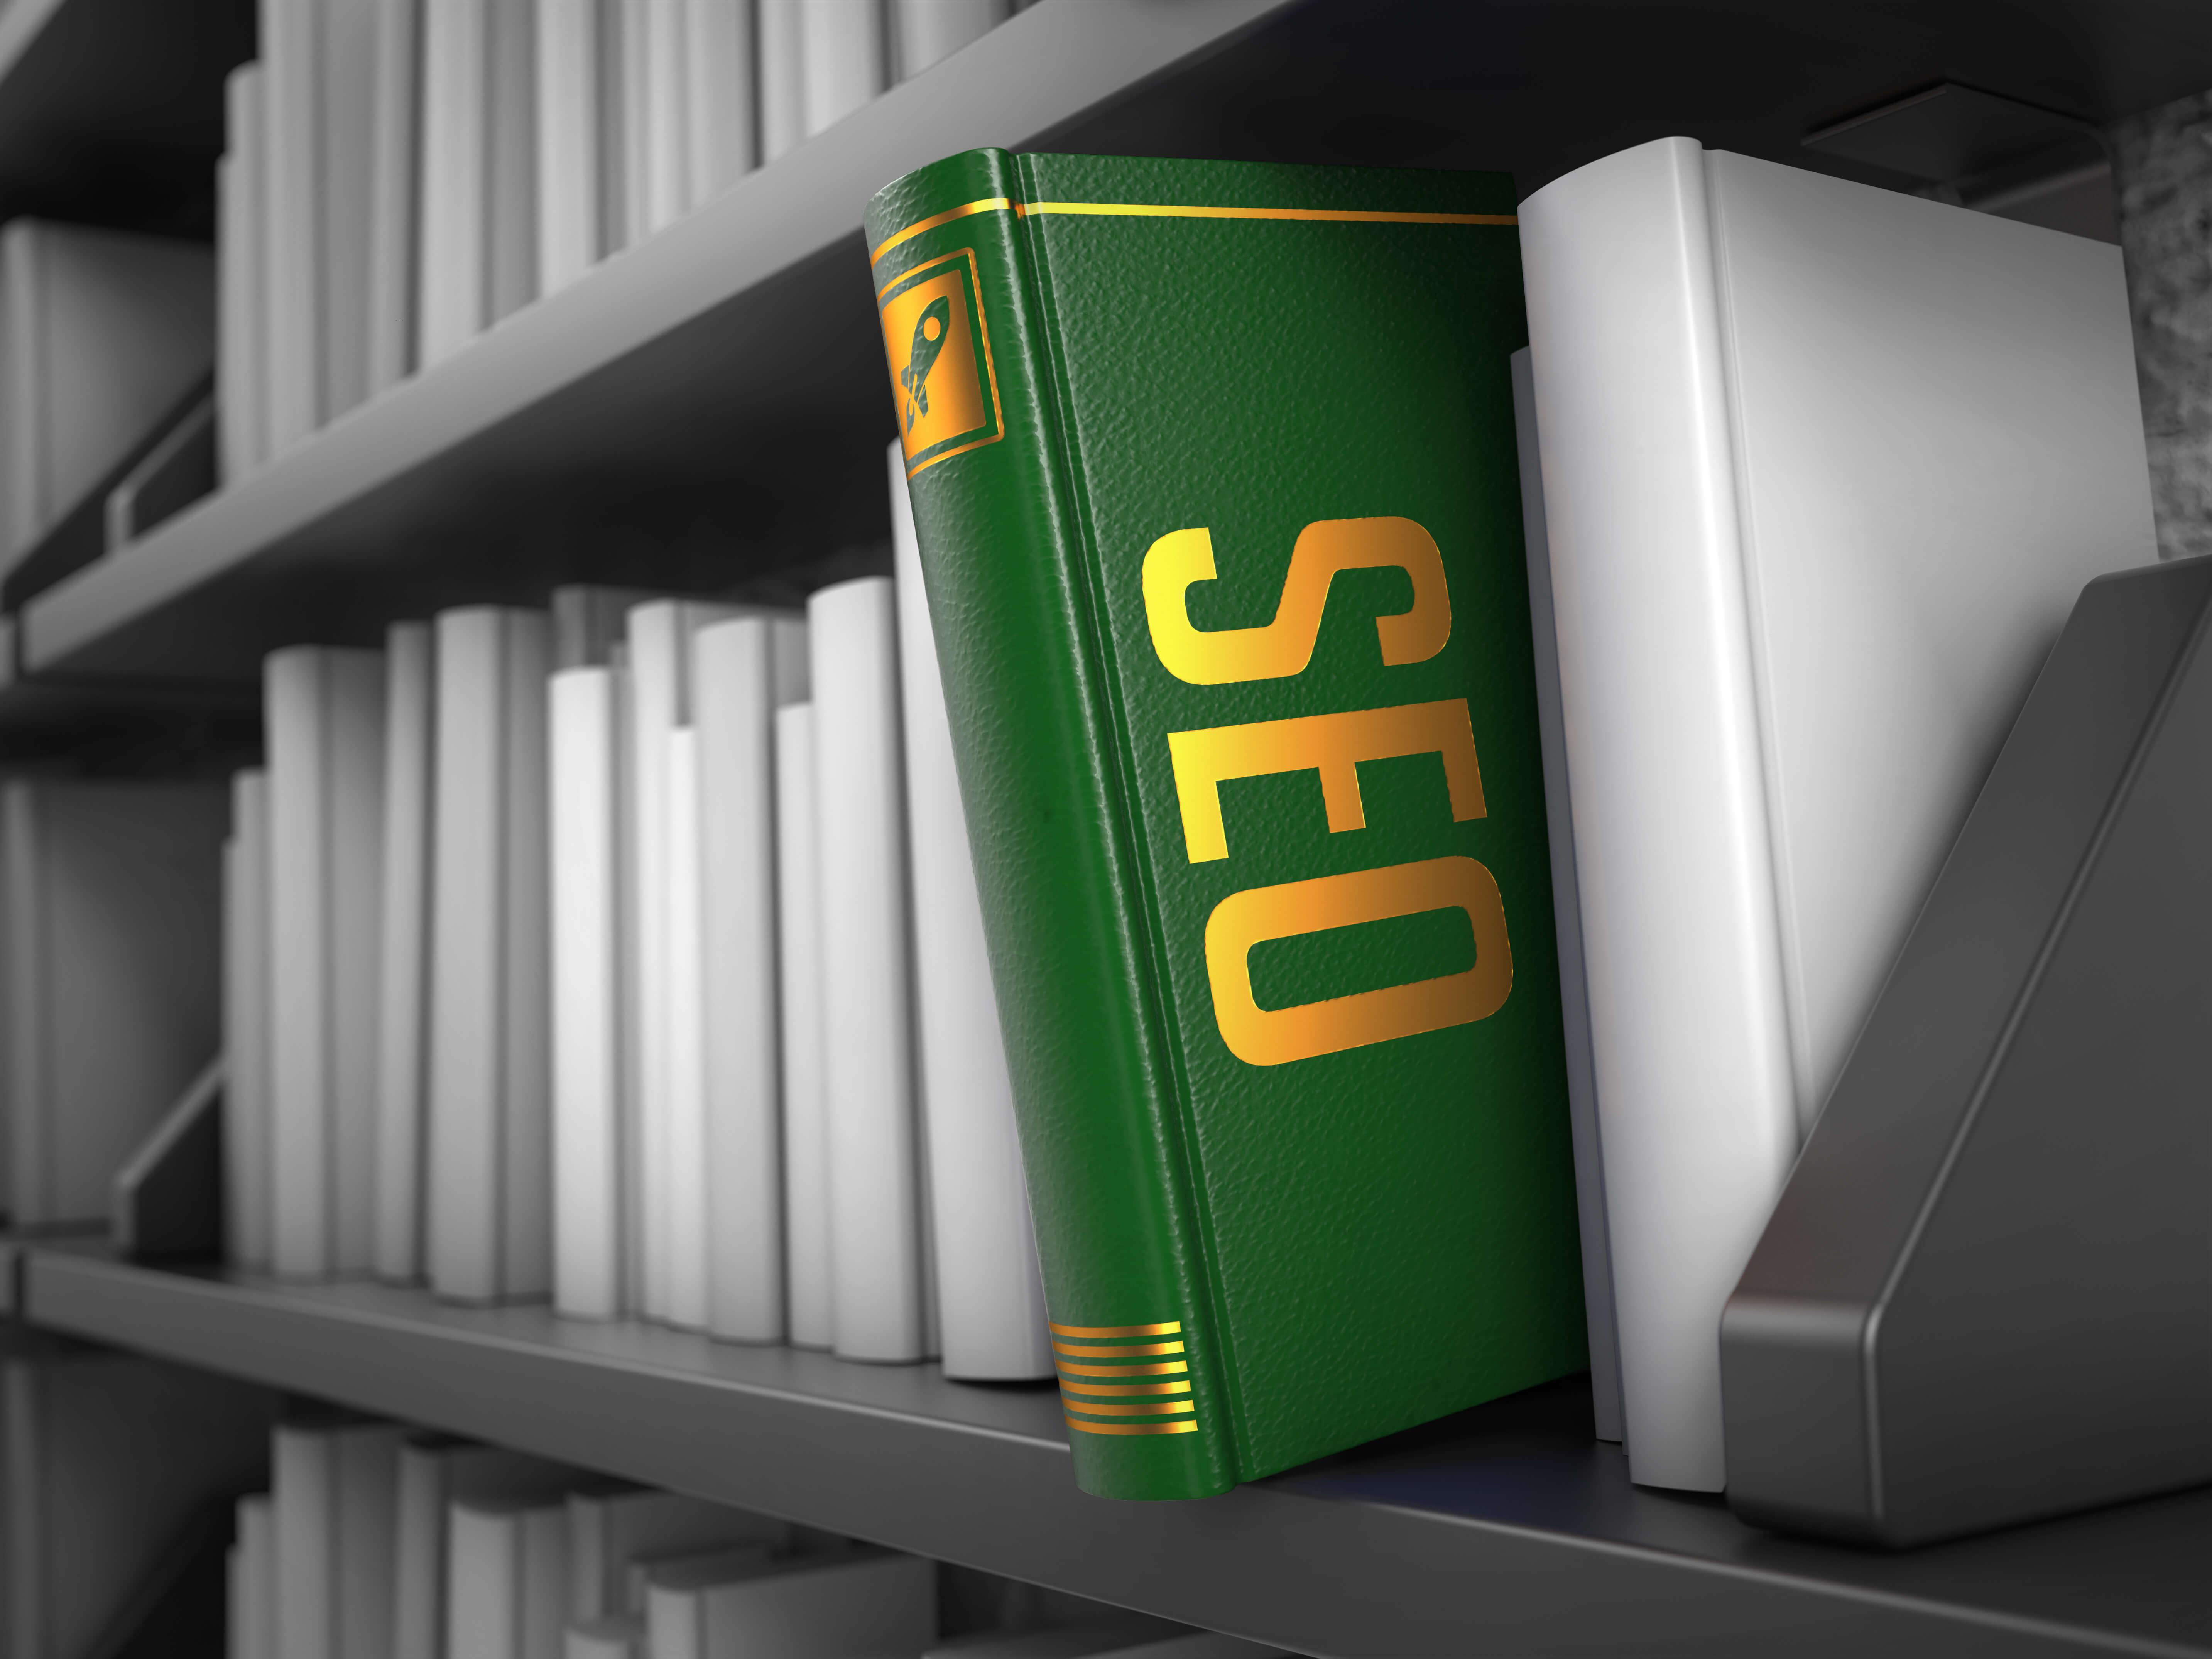 【SEO対策の参考本8選】概念や基本・テクニック・コンテンツ作成の各ジャンルでおすすめの本!